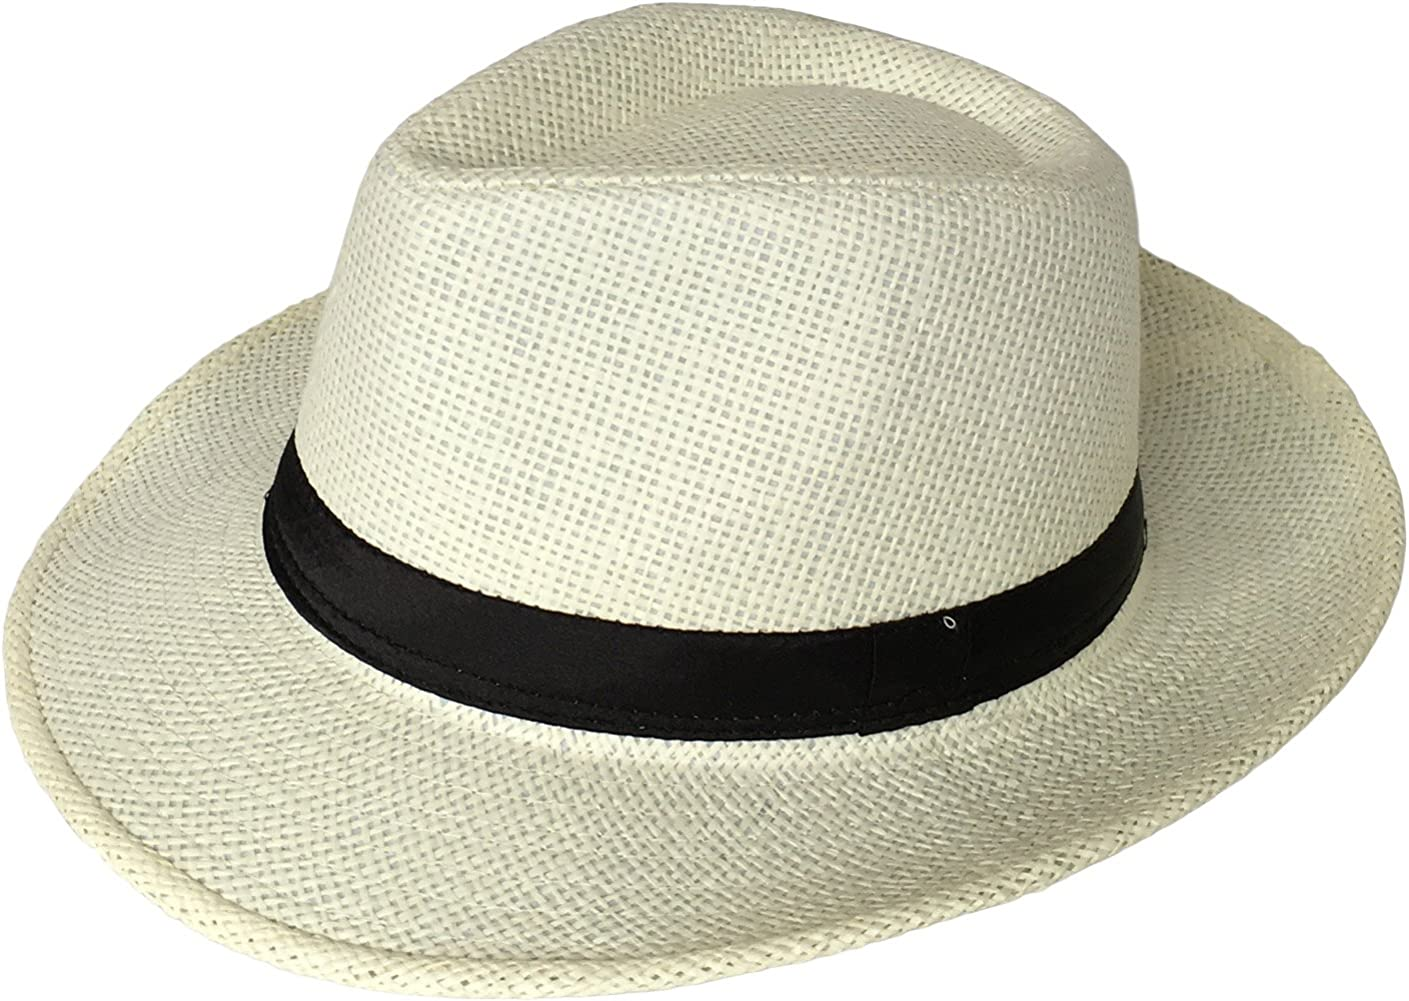 Miobo Sombrero de paja Panamahut Mountain Stroh sombrero de paja sombrero de verano